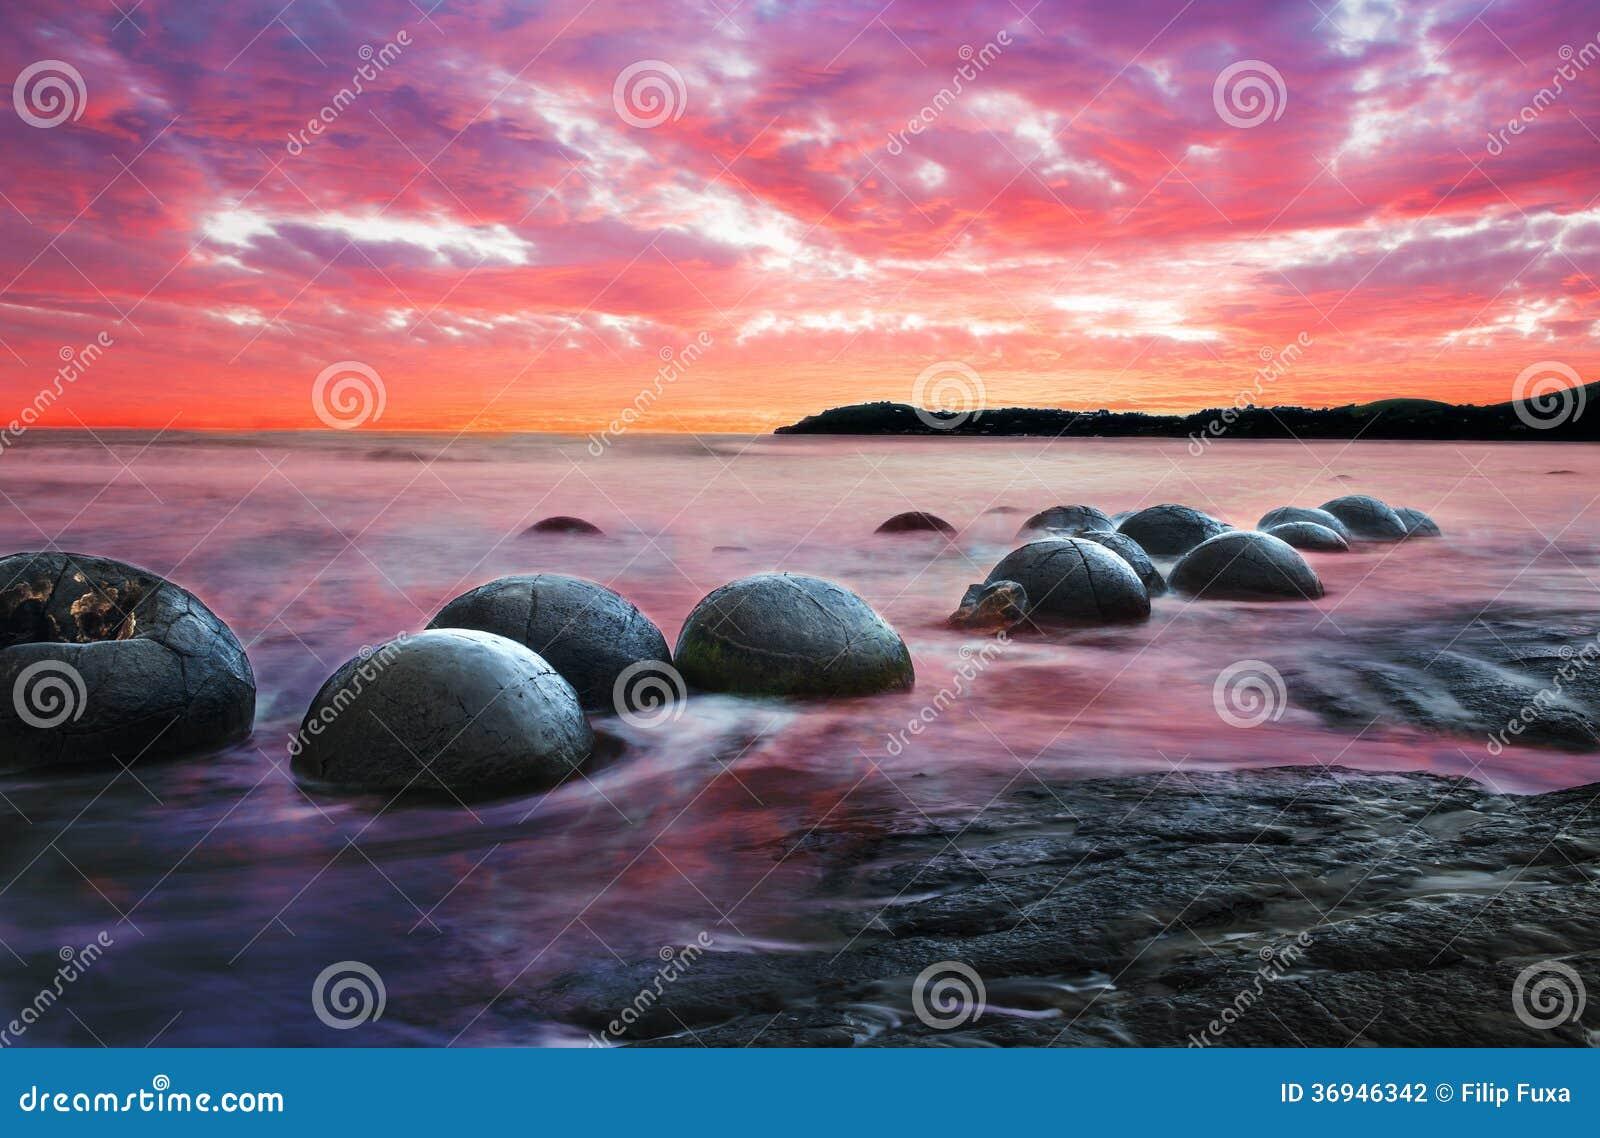 Moeraki Boulders on the Koekohe beach, Eastern coast of New Zealand ... Pacific Ocean Underwater Animals